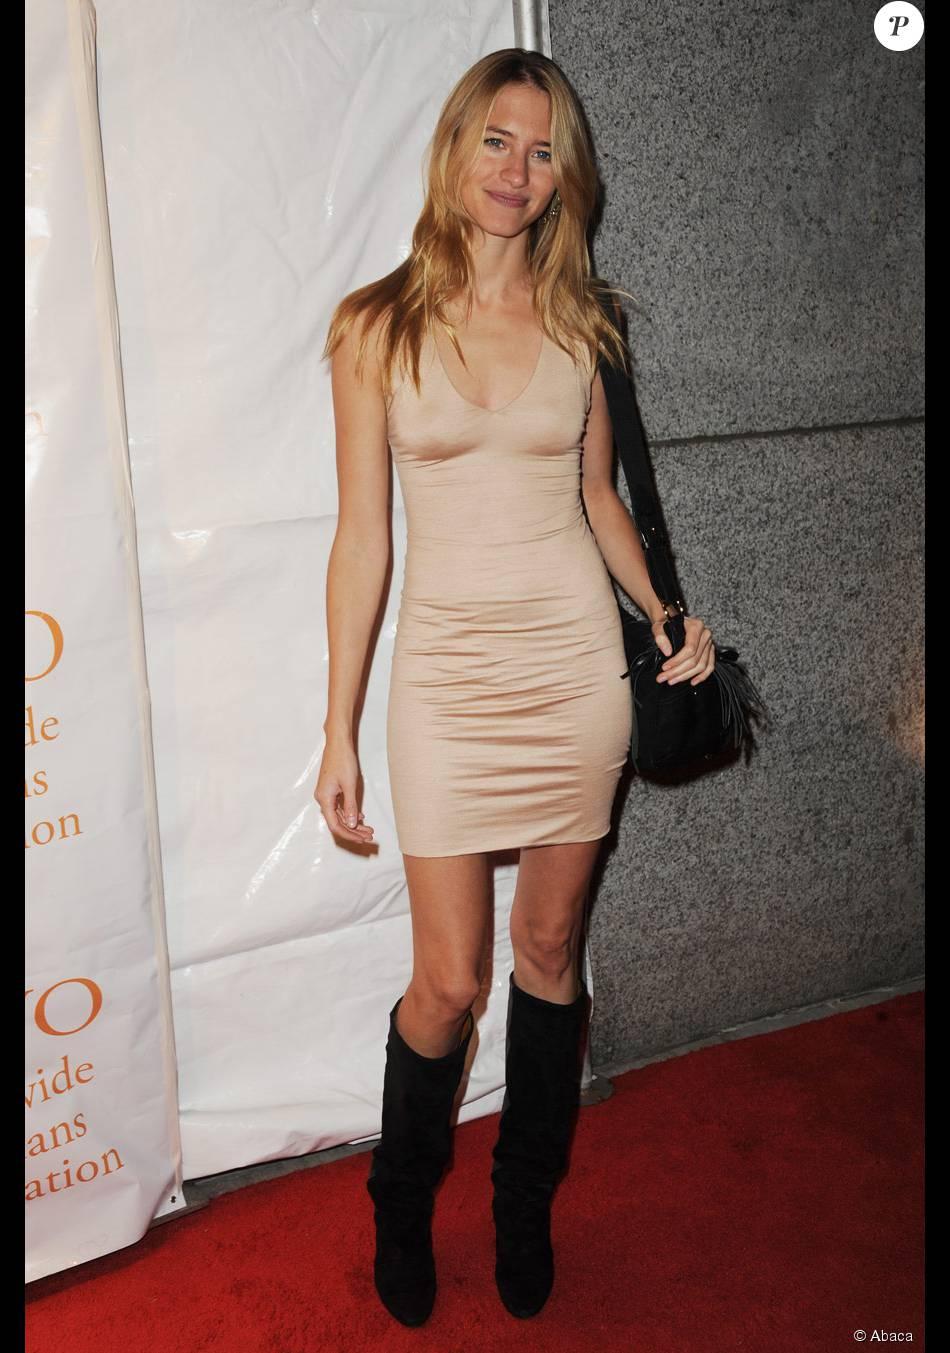 Susanna Hunt,Barbara Fialho BRA 7 2012?resent Hot pictures Damaris Lewis,Jessica Raskin